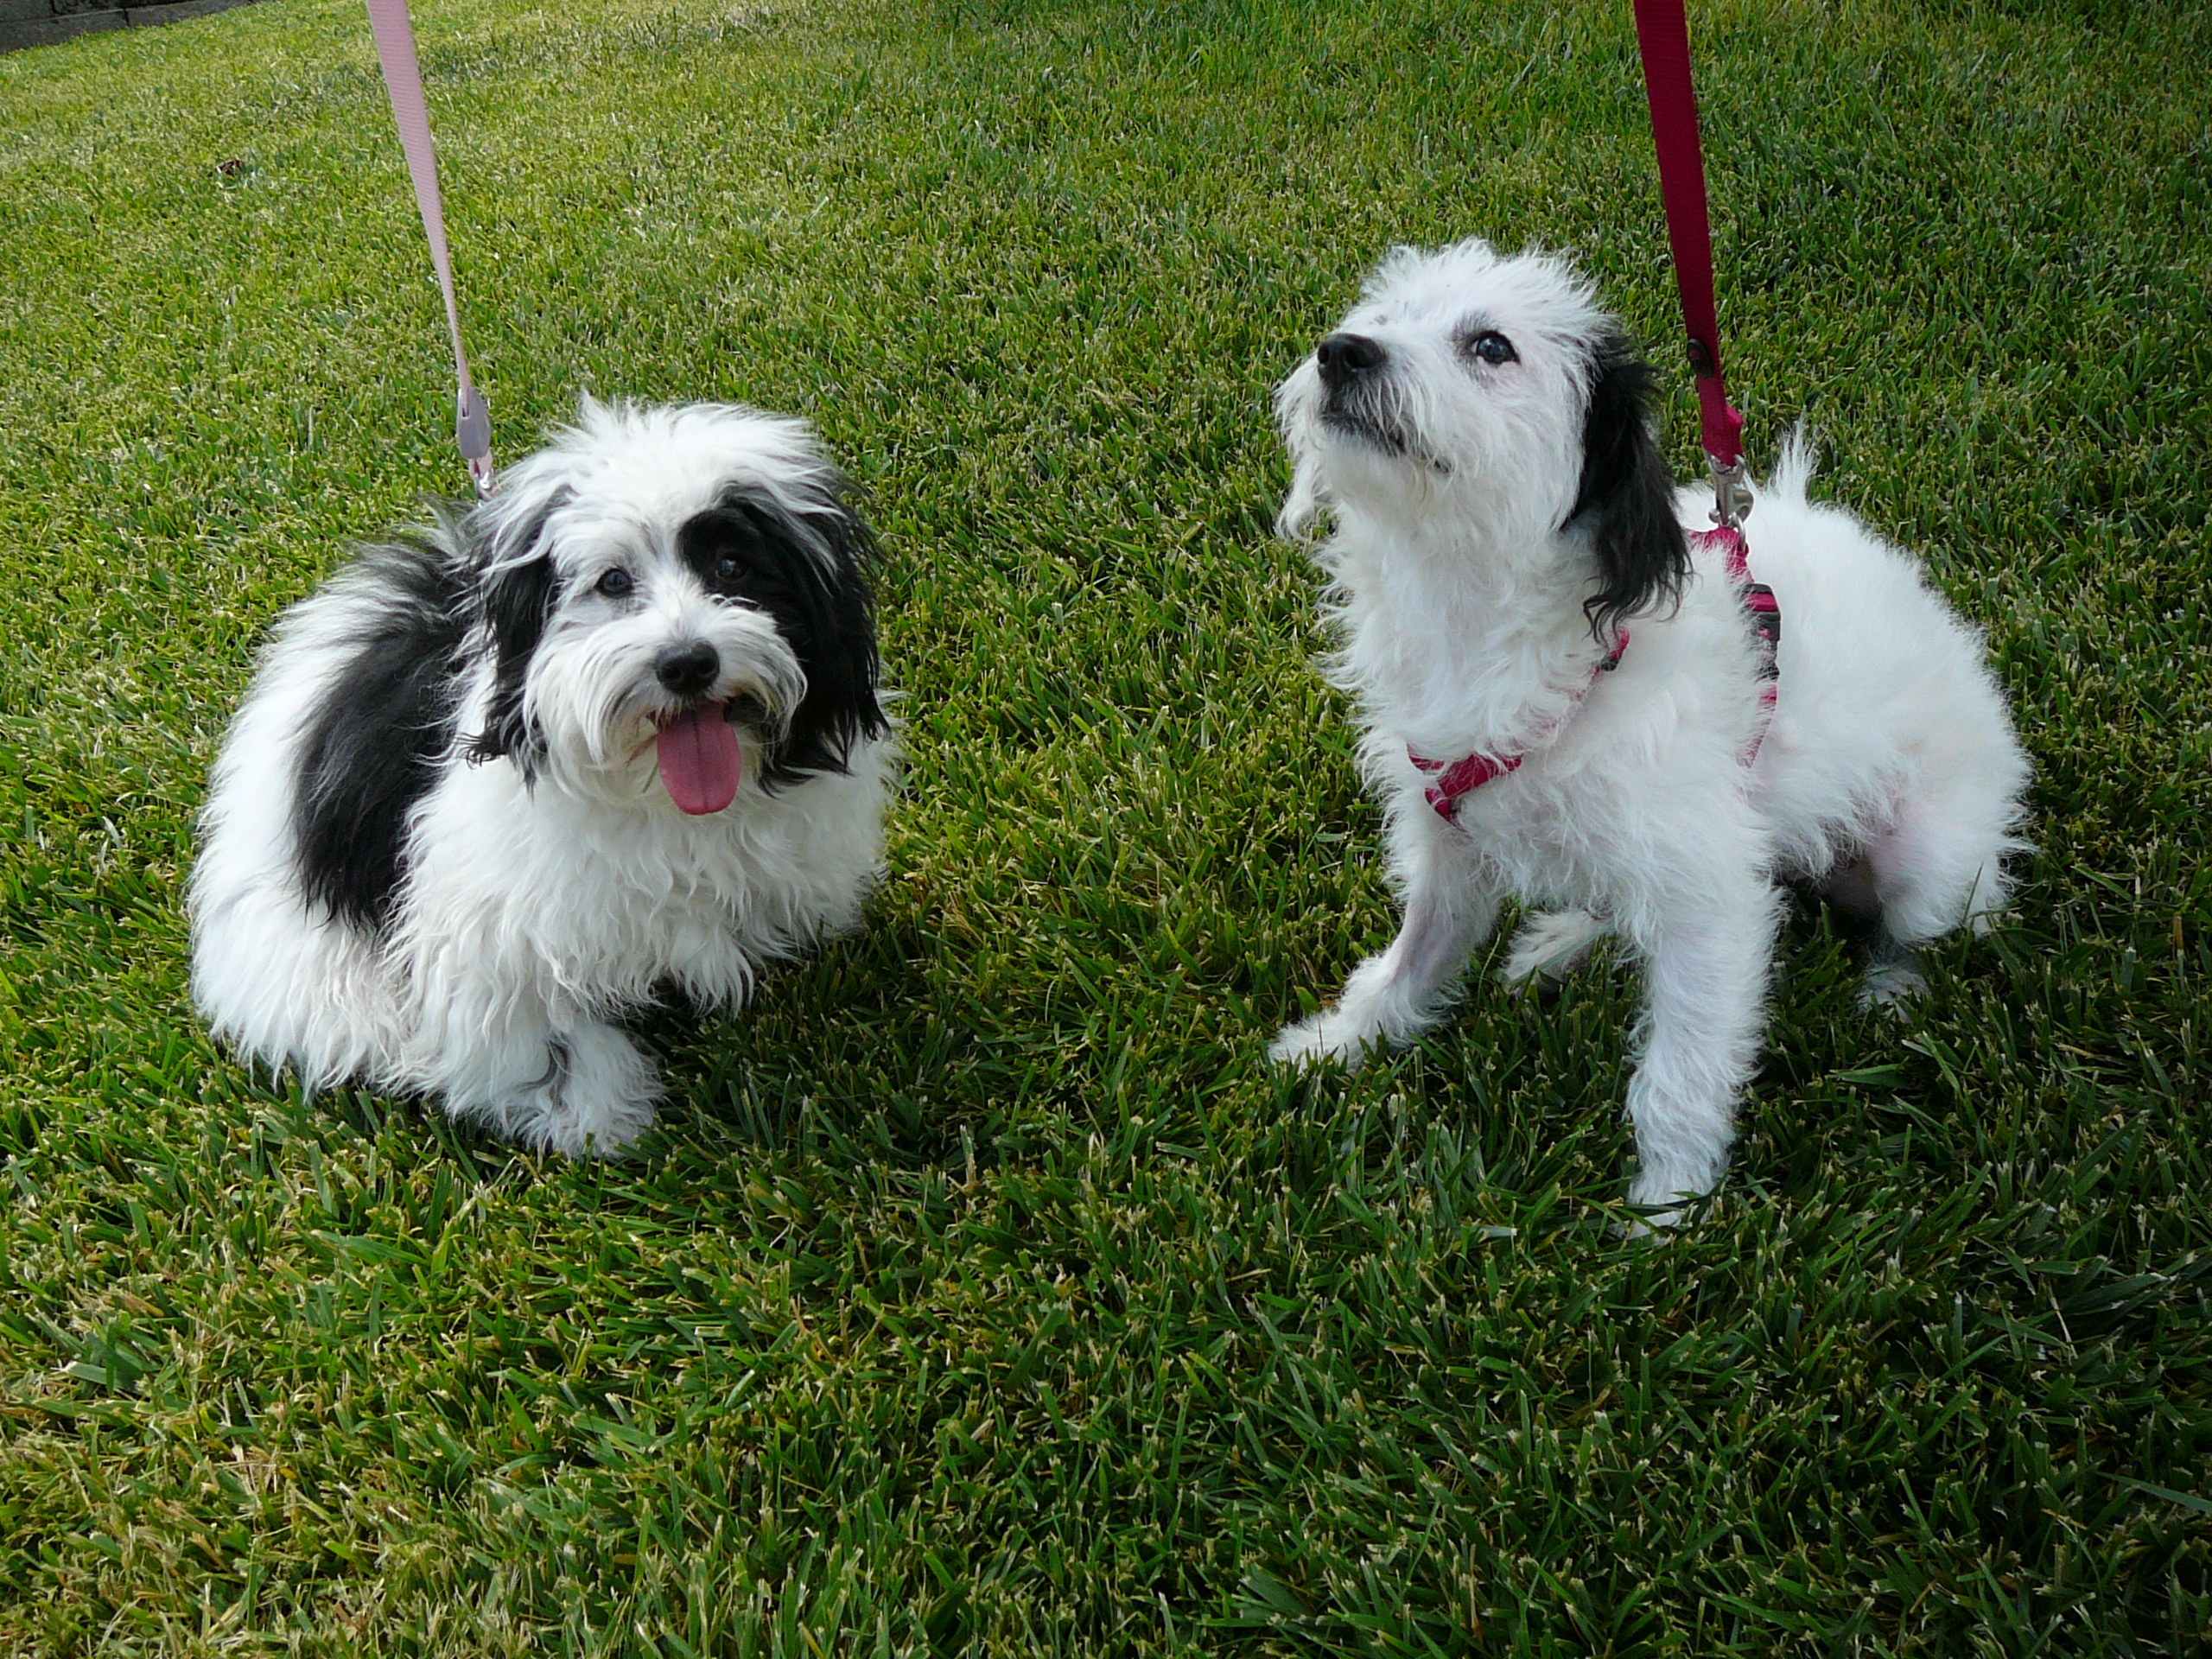 Schnauzer lhasa apso puppies